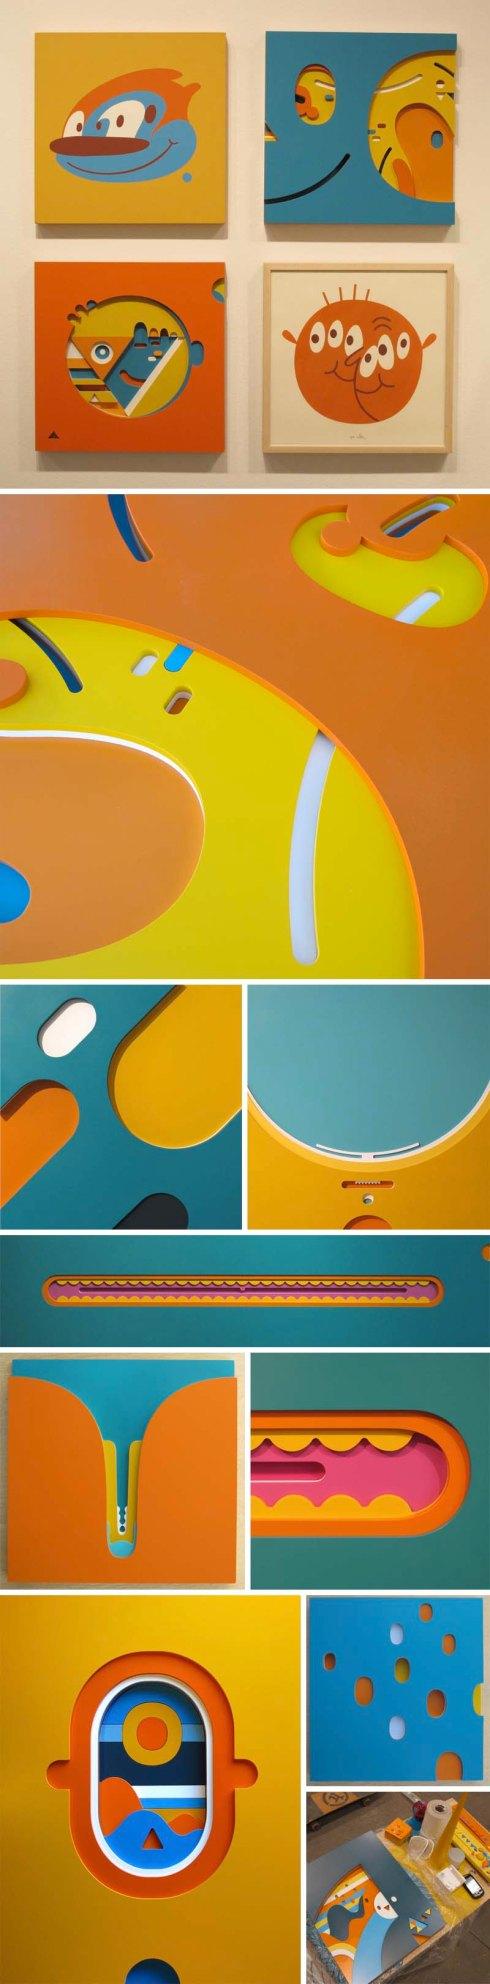 Chu Doma, Julian Pablo Manizelli, argentinean street artist, colorful, multilayer, sculpture, illustration